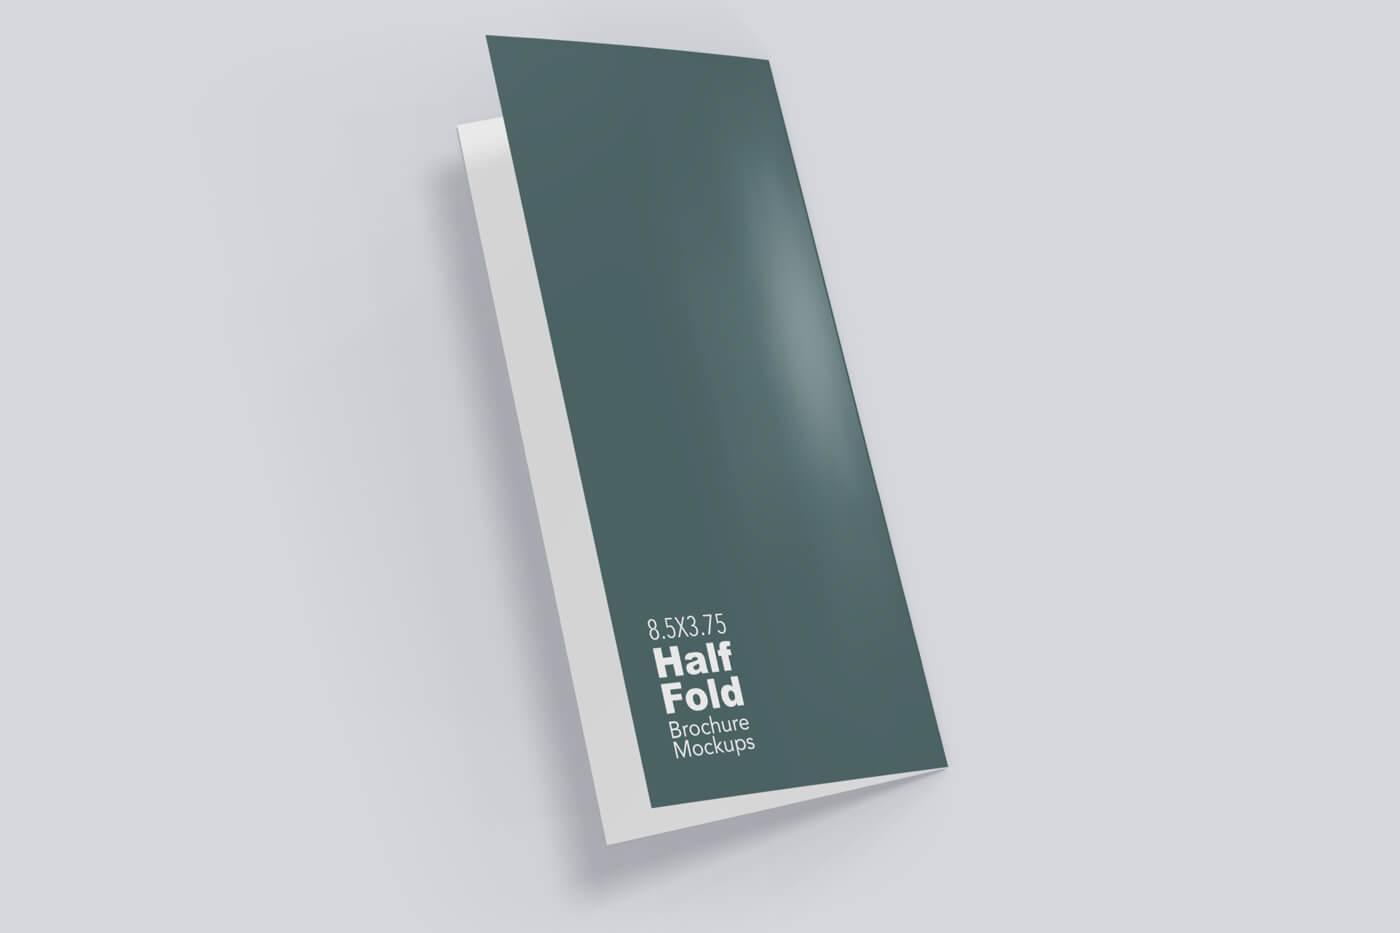 8.5x5.5 Half Fold Vertical Brochure Mockup 04